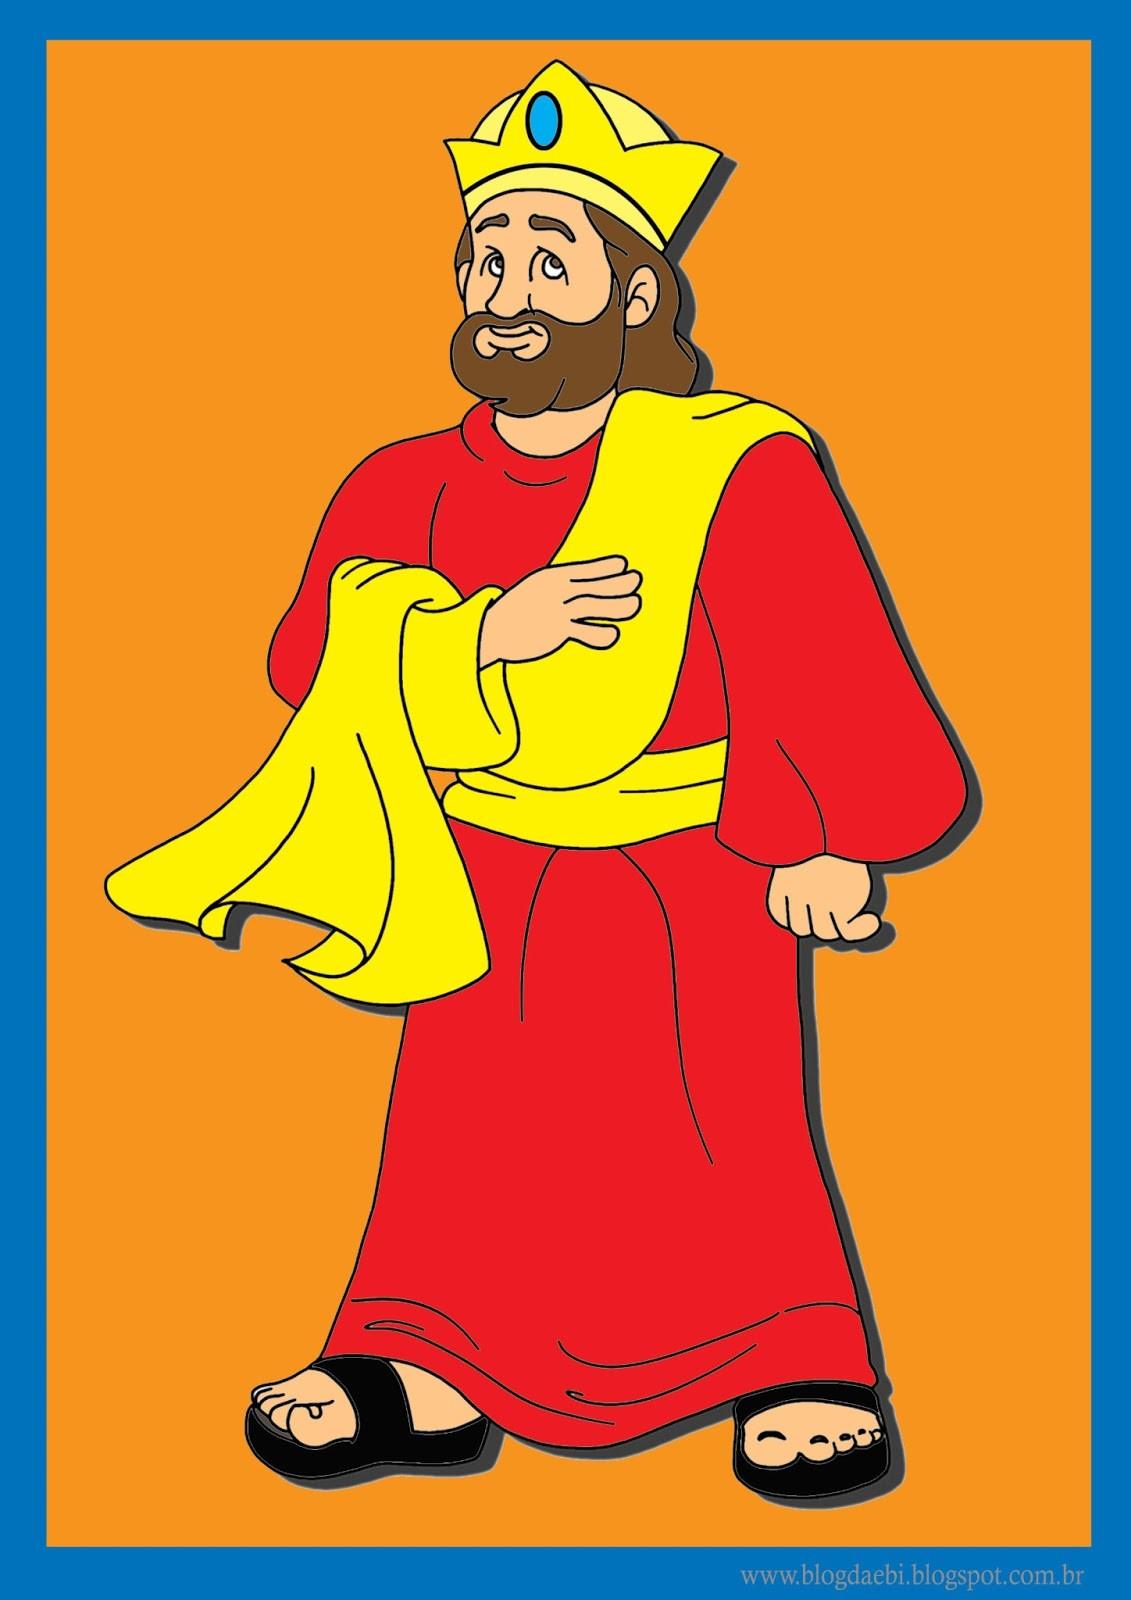 Aula Biblica Principiantes 008